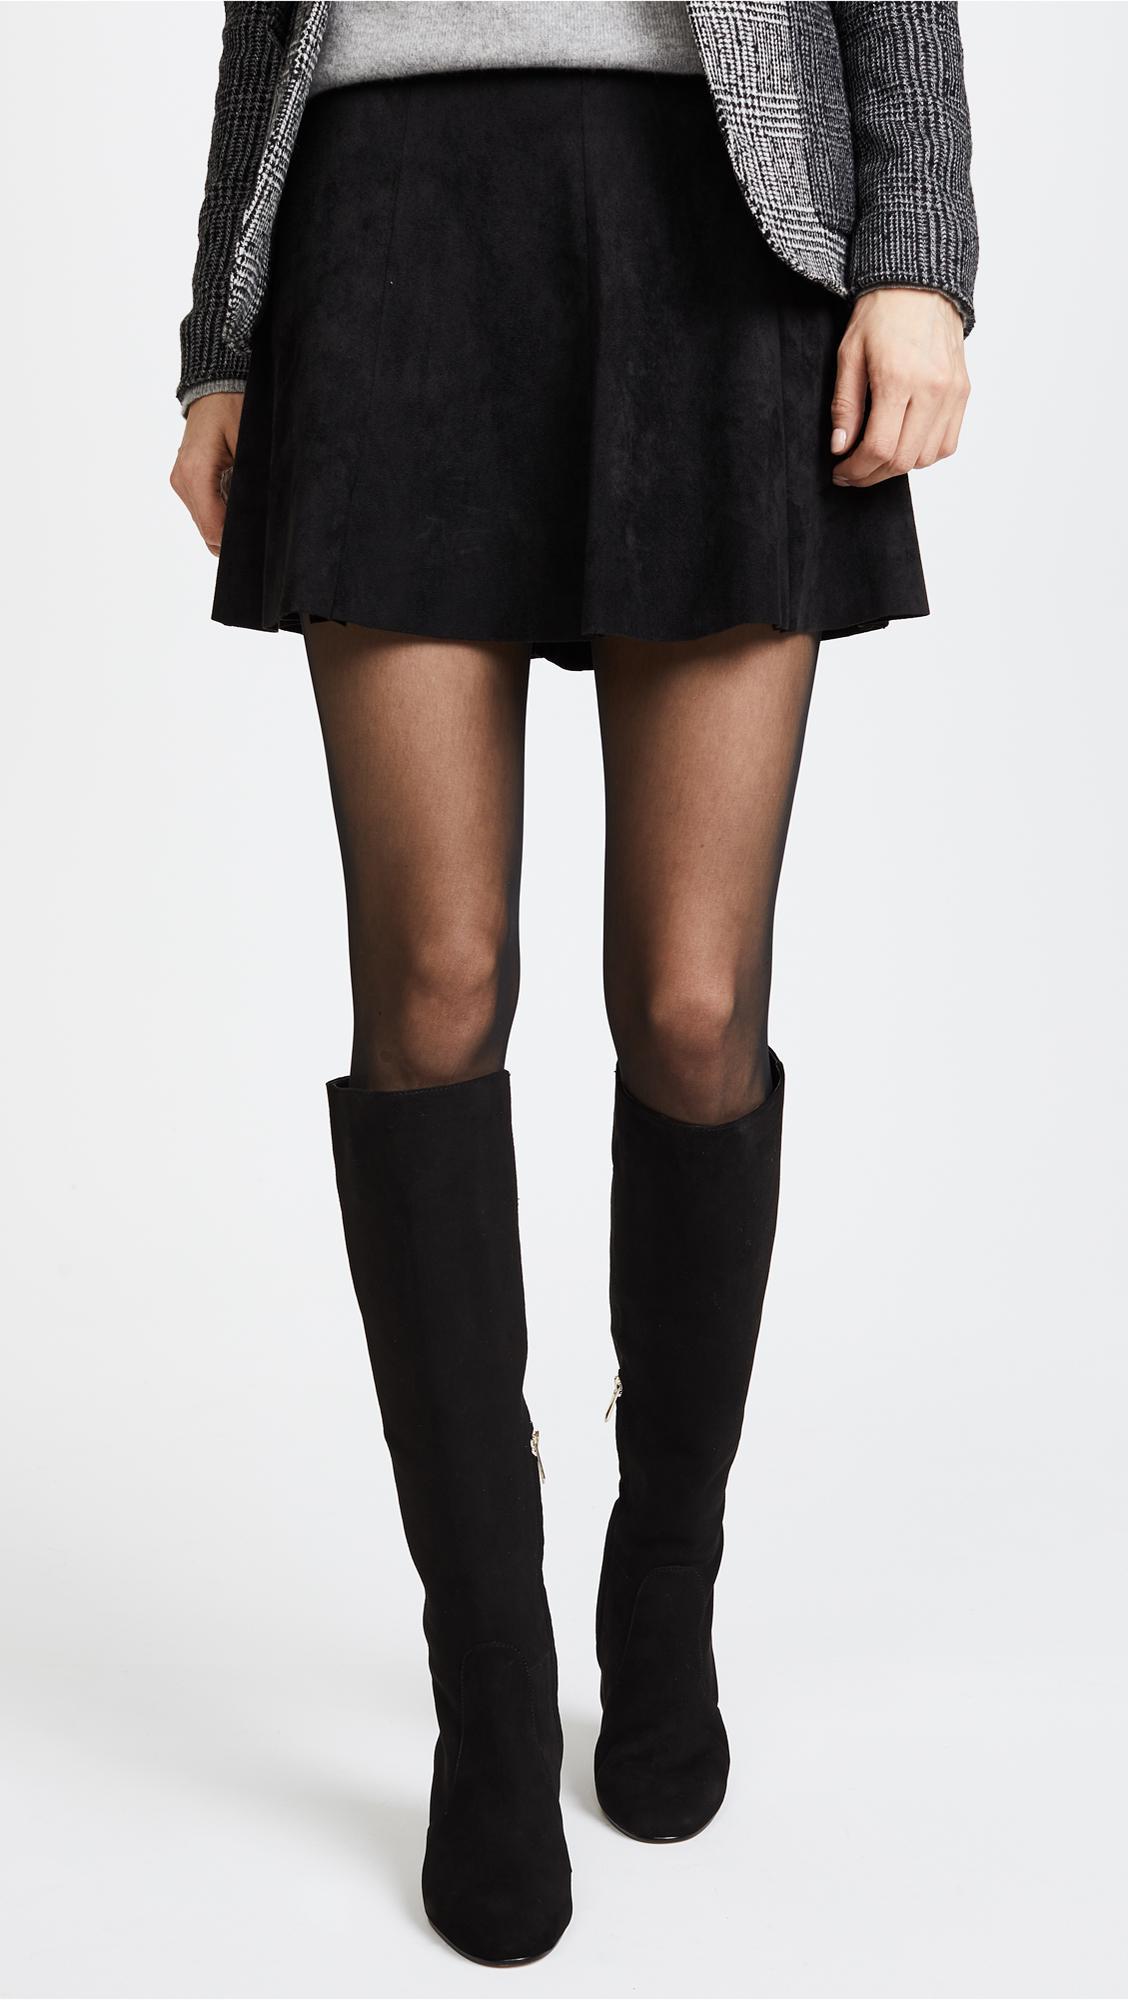 6e10dd58798 Lyst - Sam Edelman Thora Tall Boots in Black